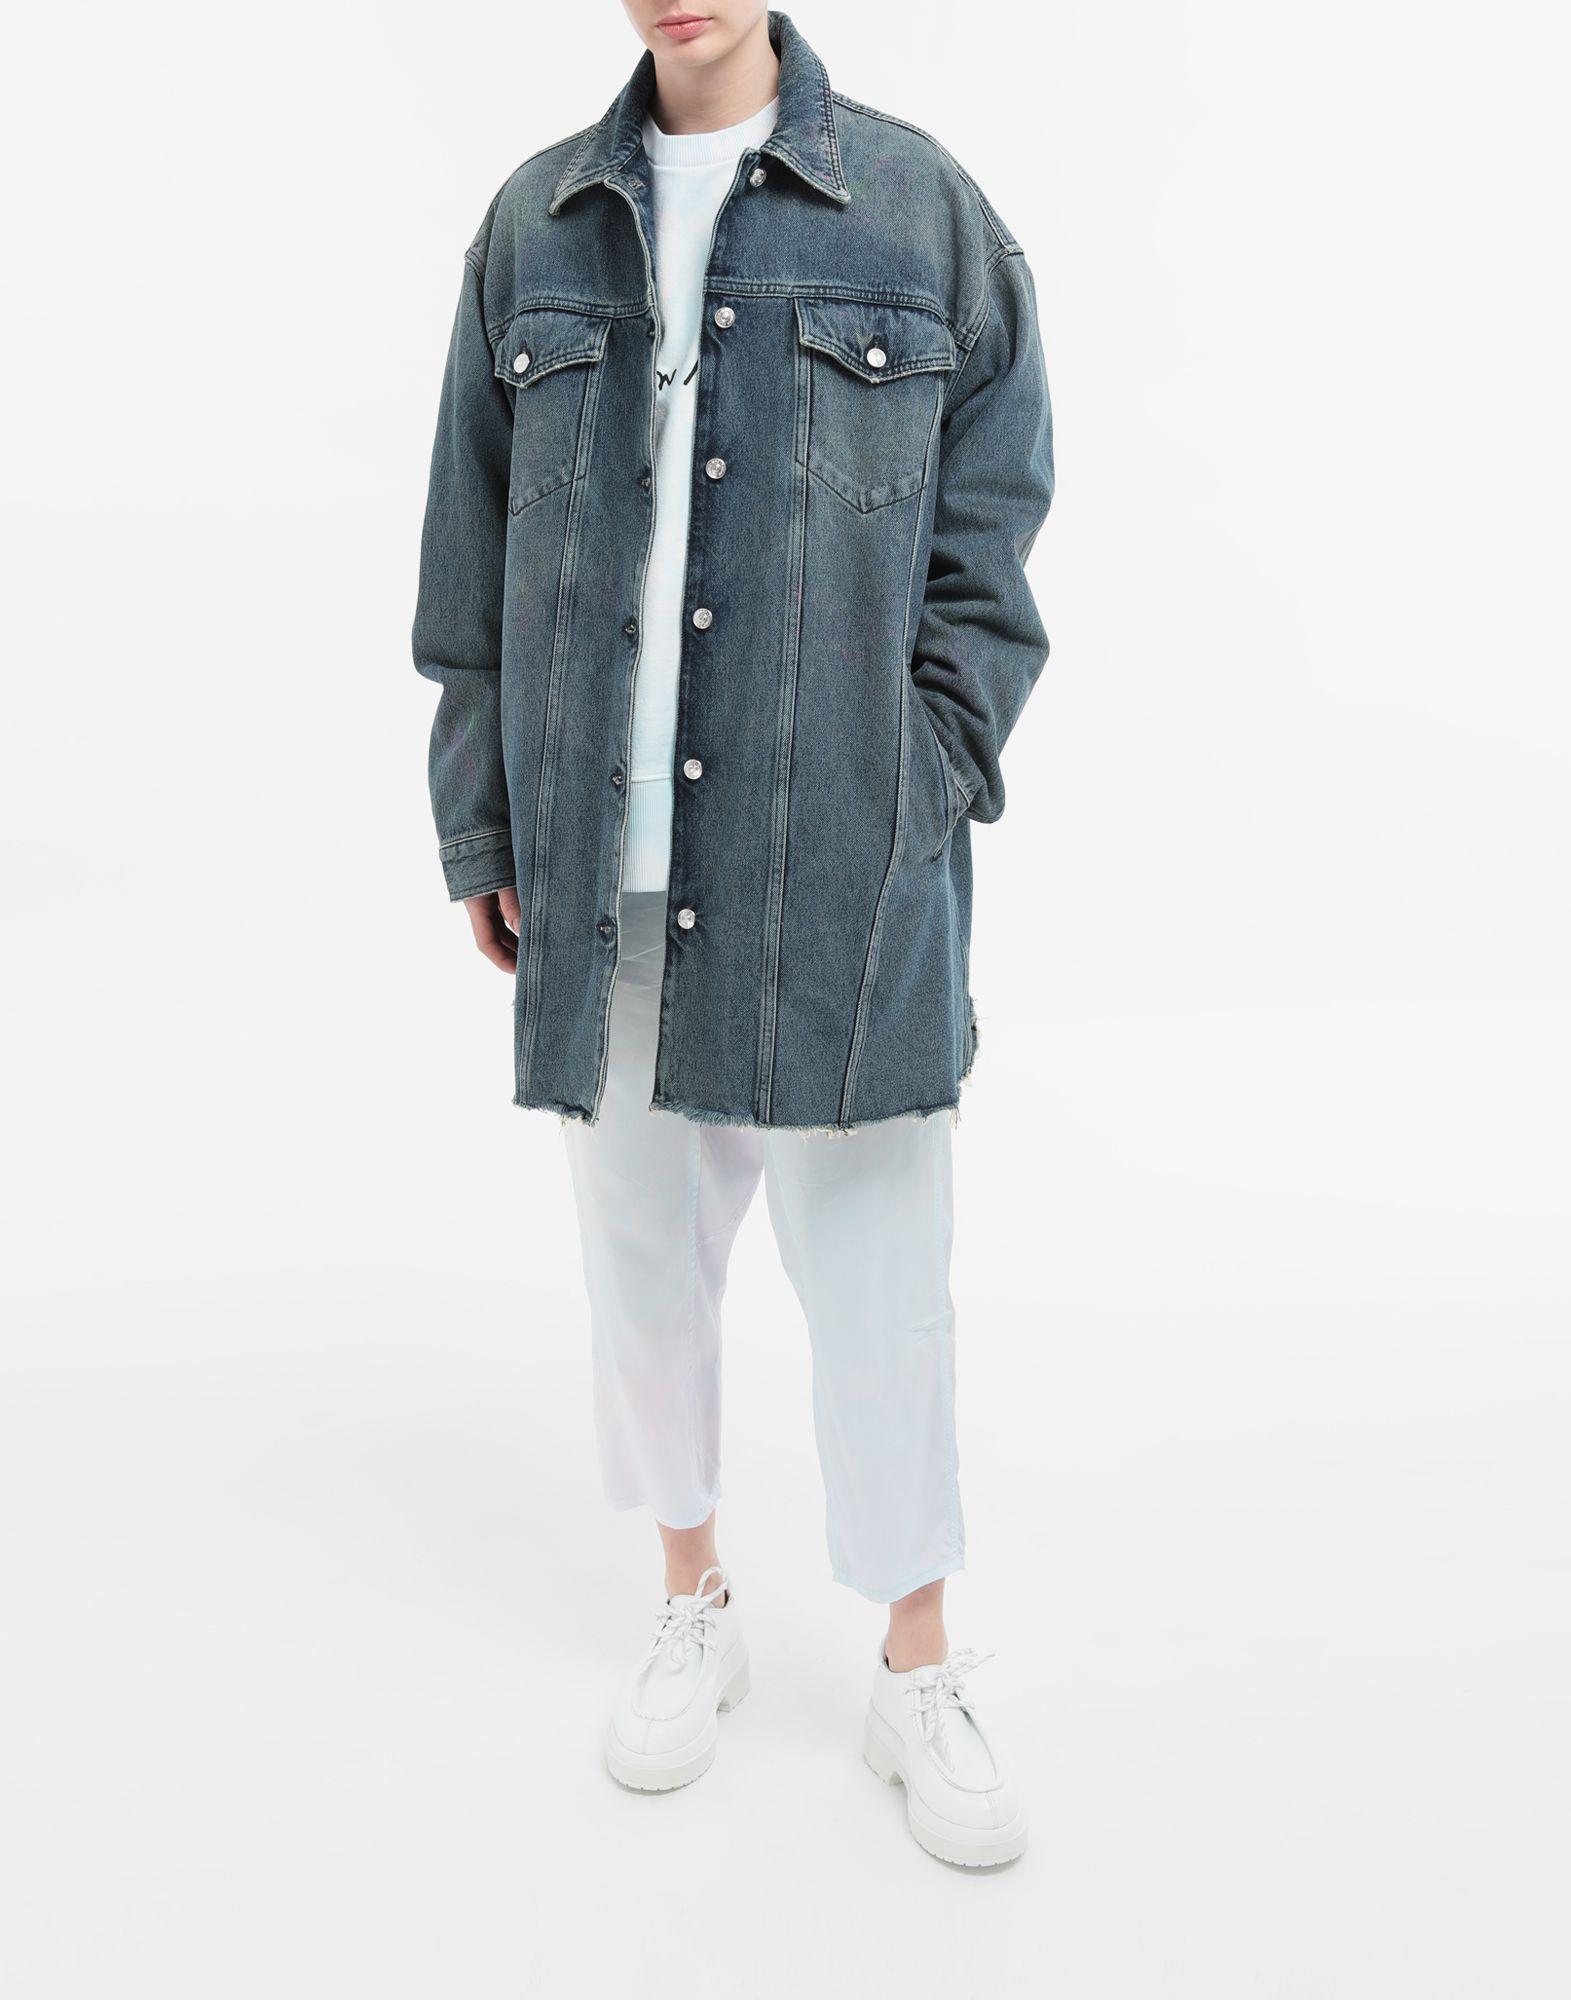 MM6 MAISON MARGIELA Oversized highlighter-treated denim jacket Jacket Woman d